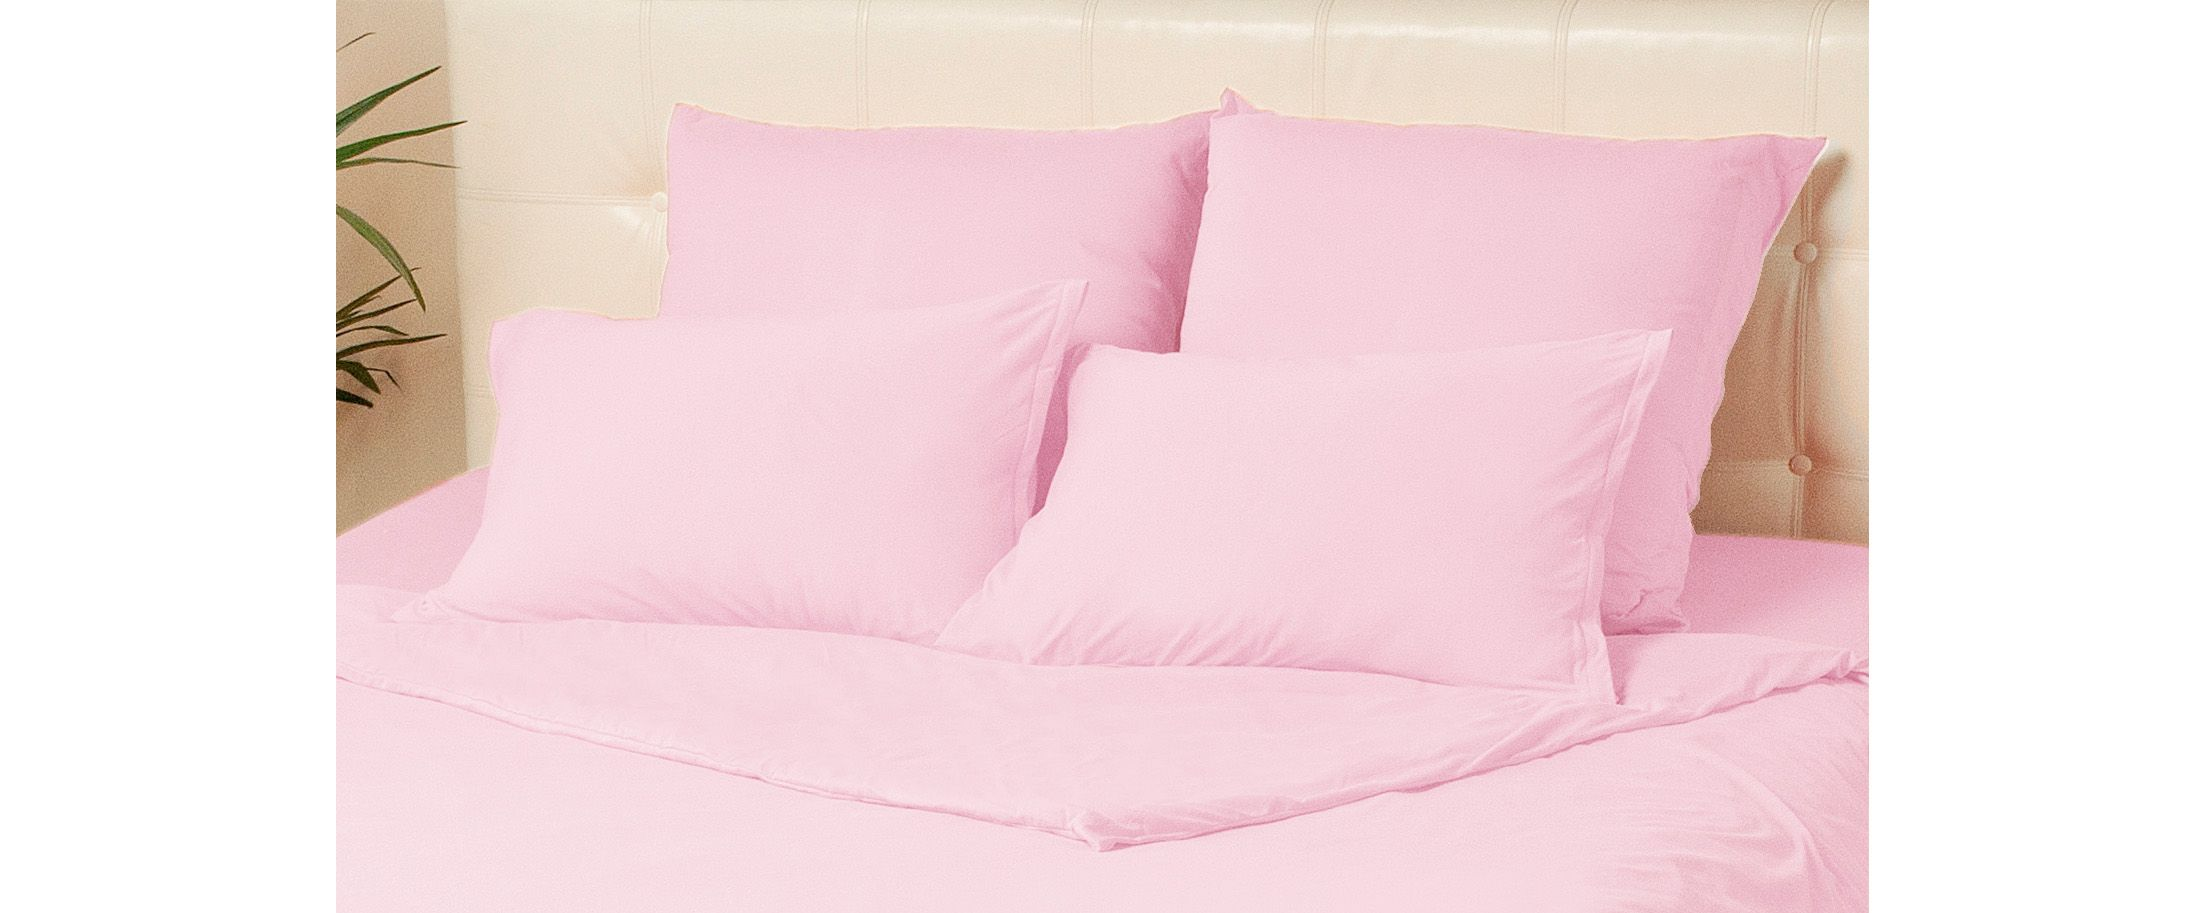 Комплект наволочек на молнии 70х70 розового цвета Violett Модель 4002Комплект наволочек на молнии 70х70 розового цвета Violett Модель 4002. Артикул К000705<br>